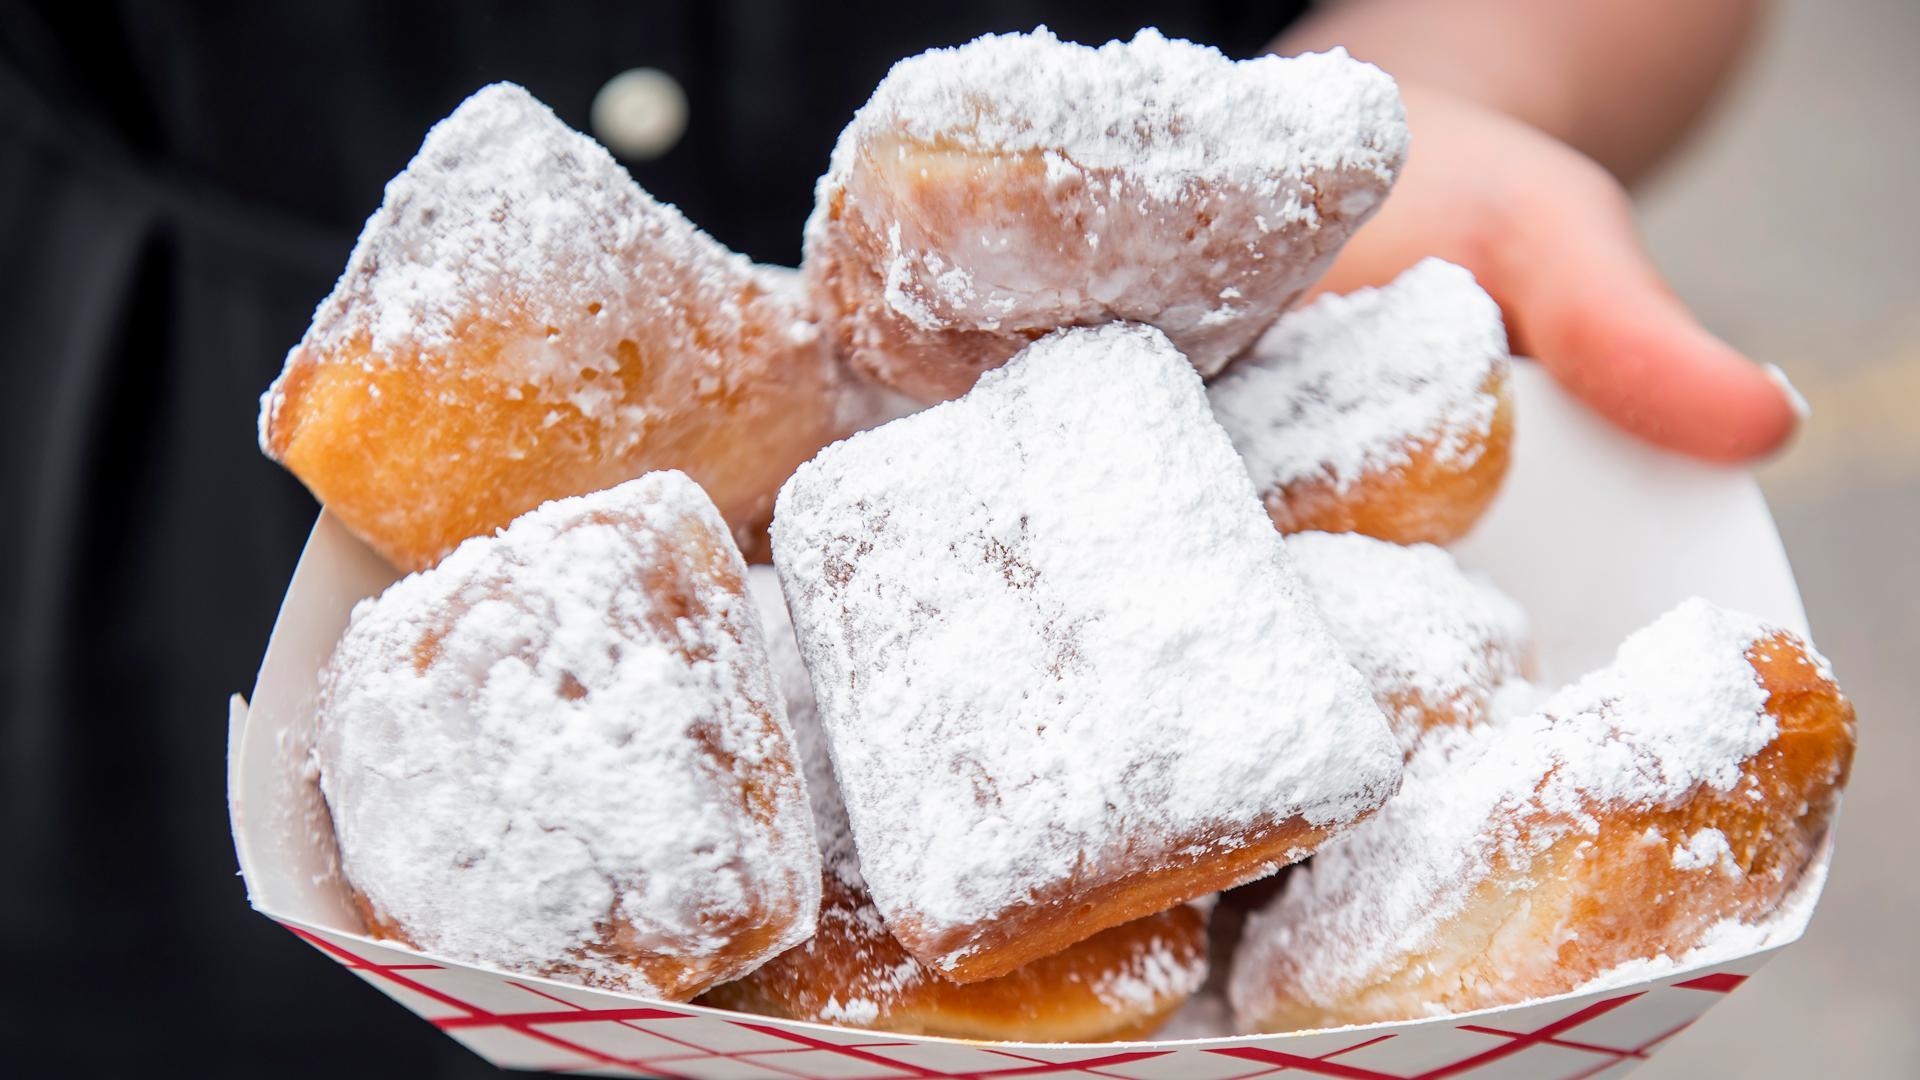 The best Toronto food markets   Beignet Shoppe serves fluffy doughnuts at Street Eats market